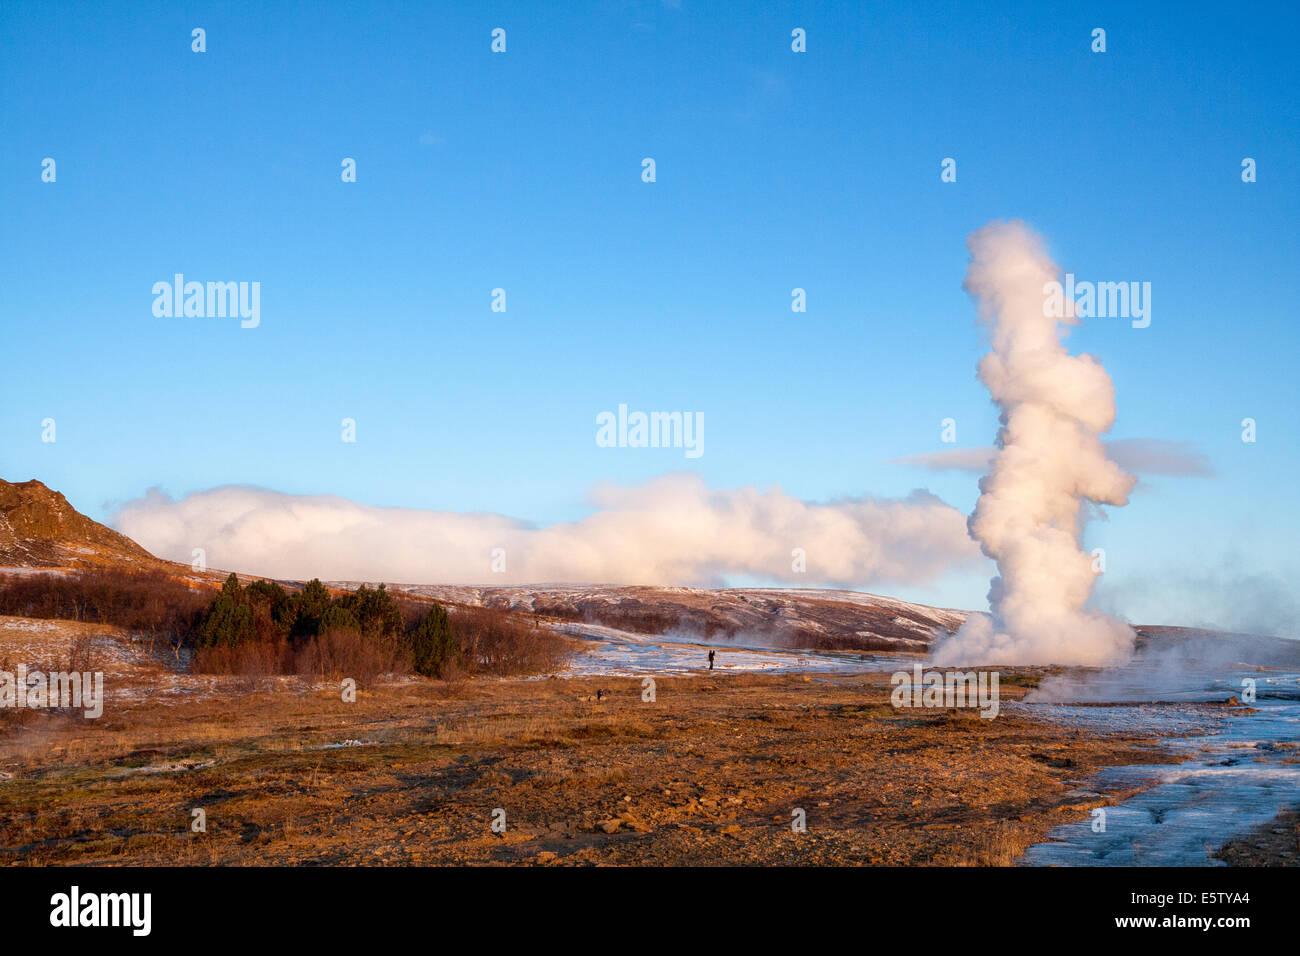 Geyser in Iceland erupting at dawn - Stock Image